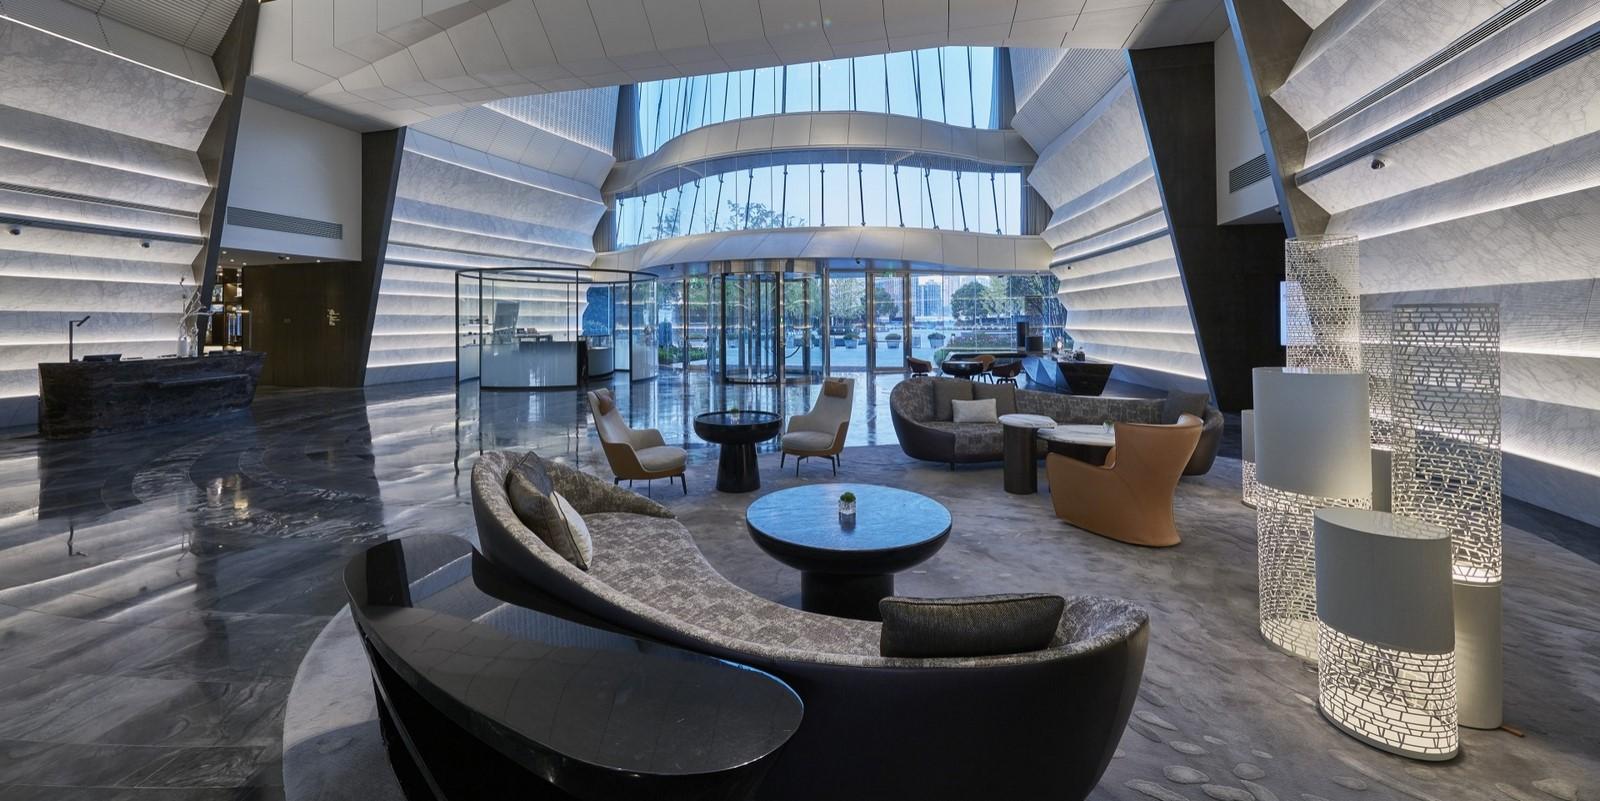 A look at Marriott Hotel's Interiors - Sheet2